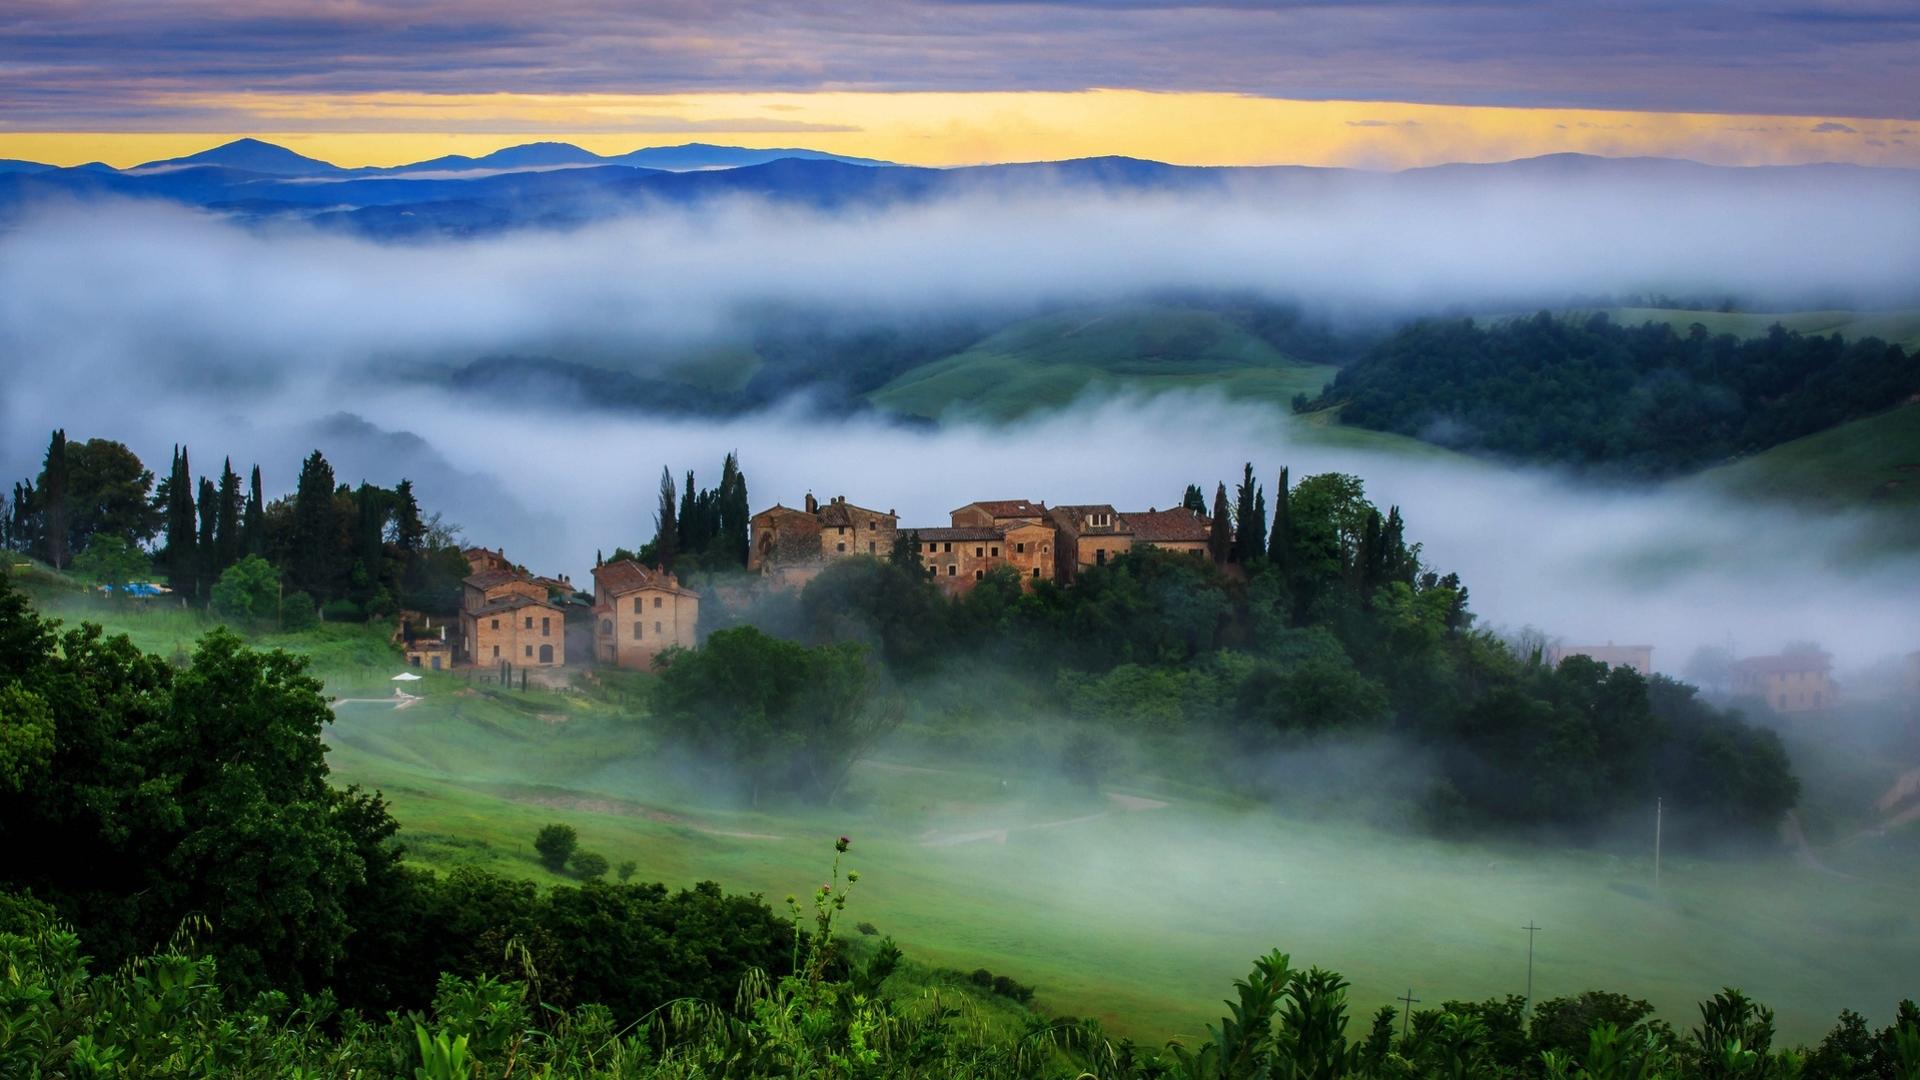 Toscana_Italy_красоты_Италии_Тоскана